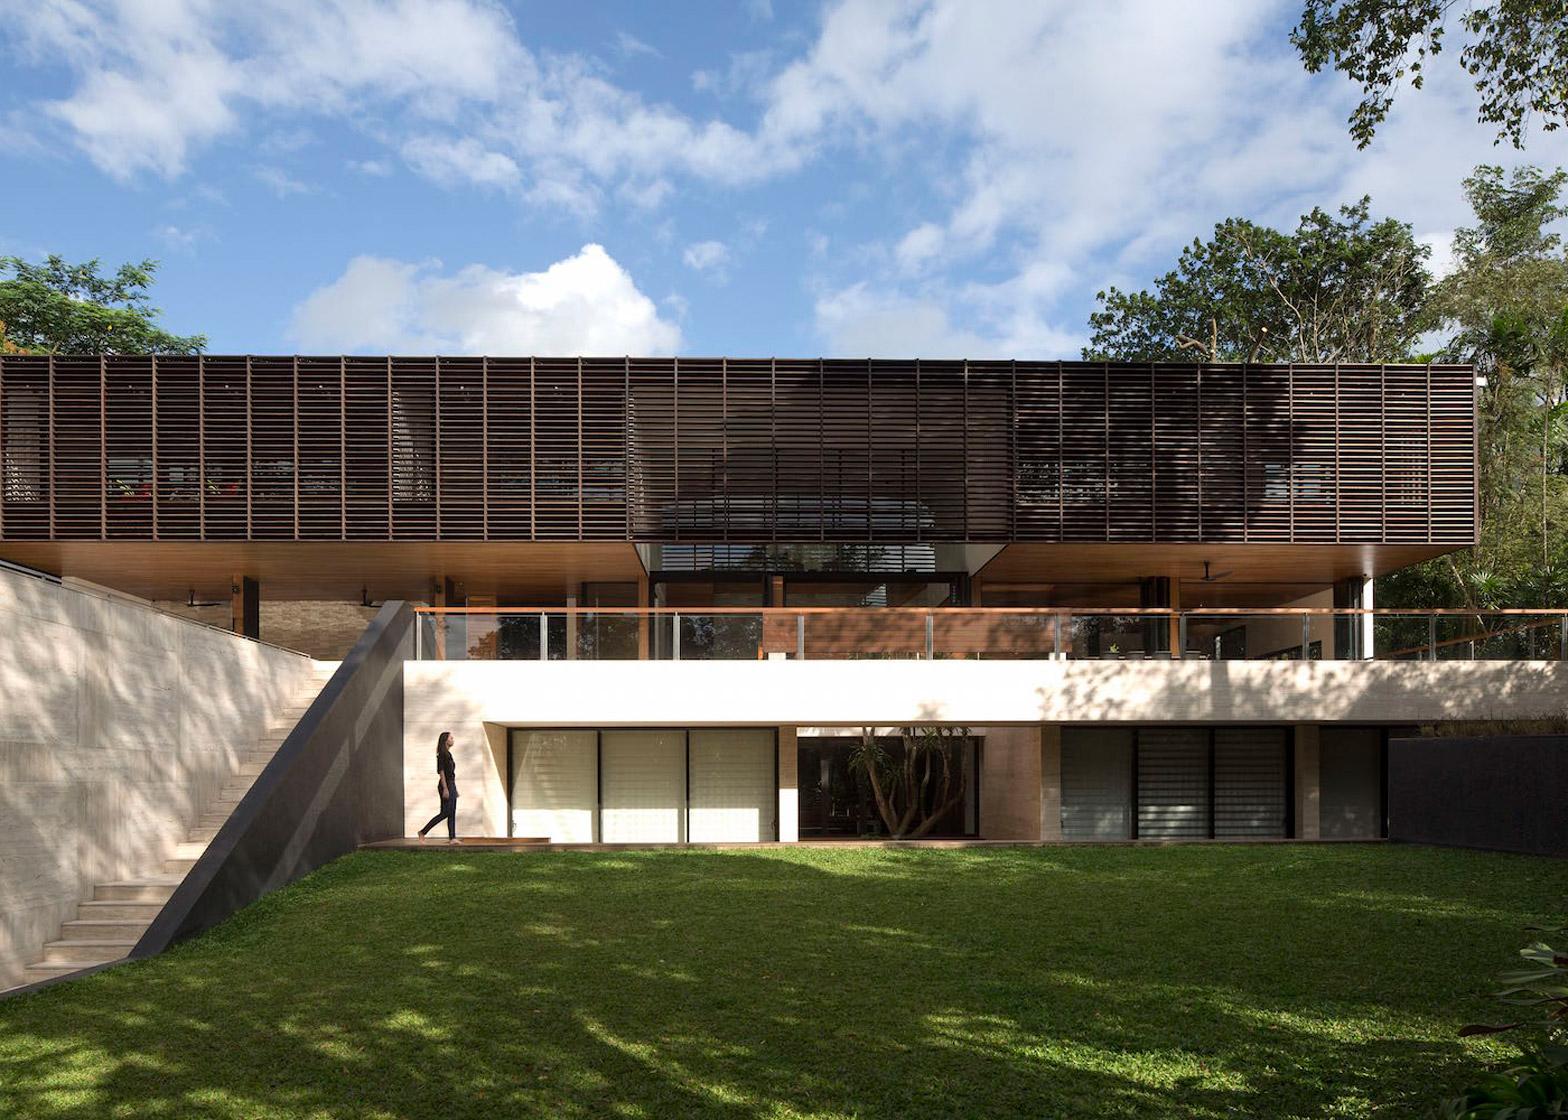 Slatted screens shade balconies at Formwerkz\u0027s Singapore residence